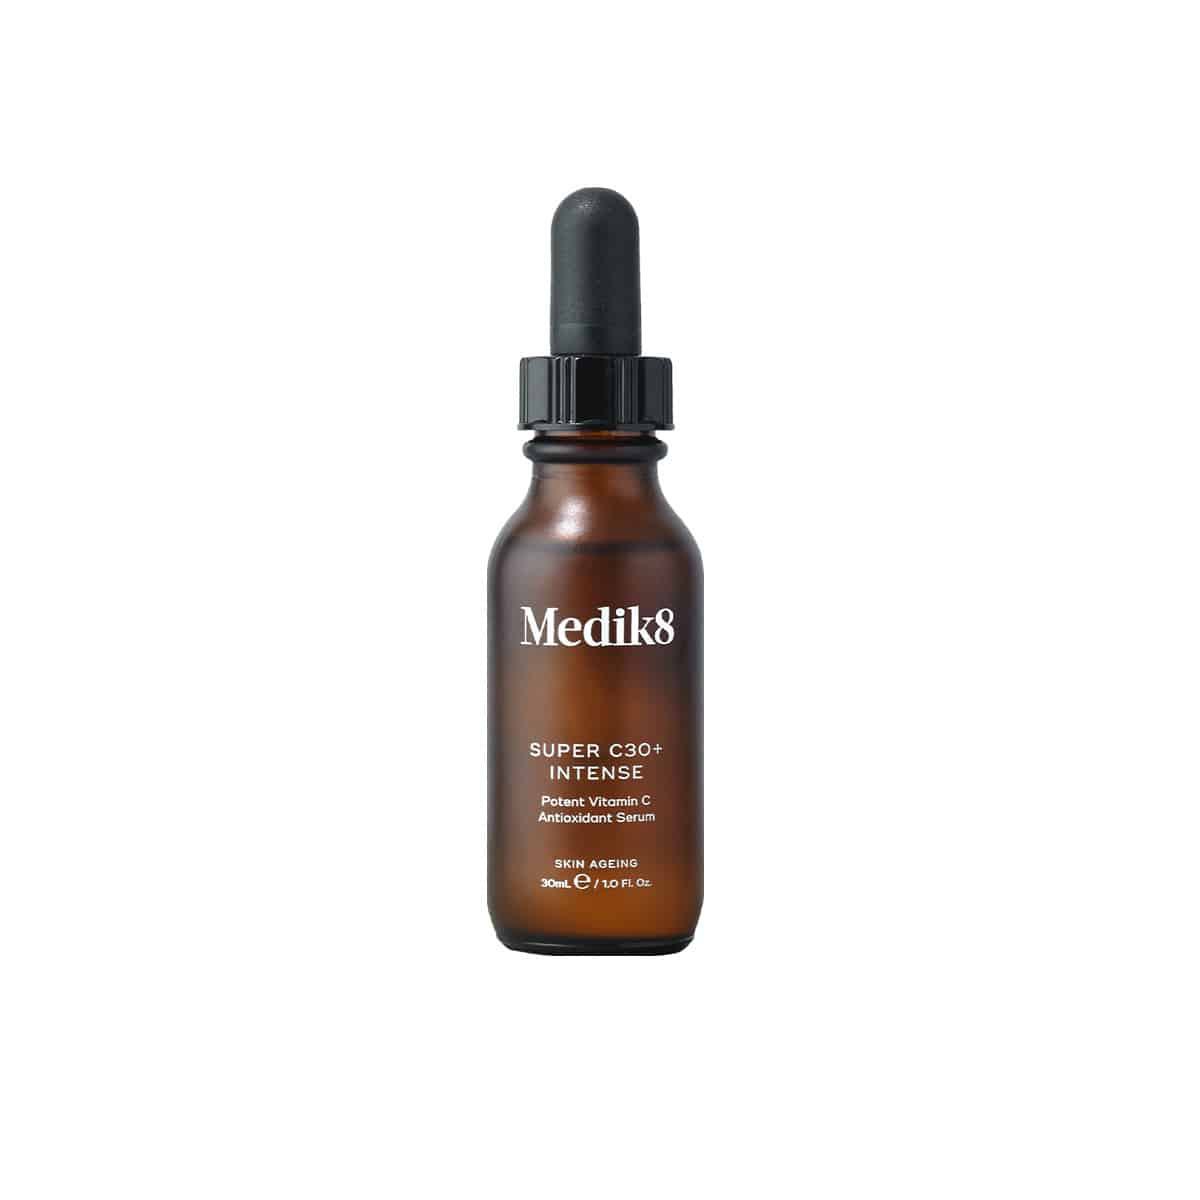 Medik8 Super C30 + Intense